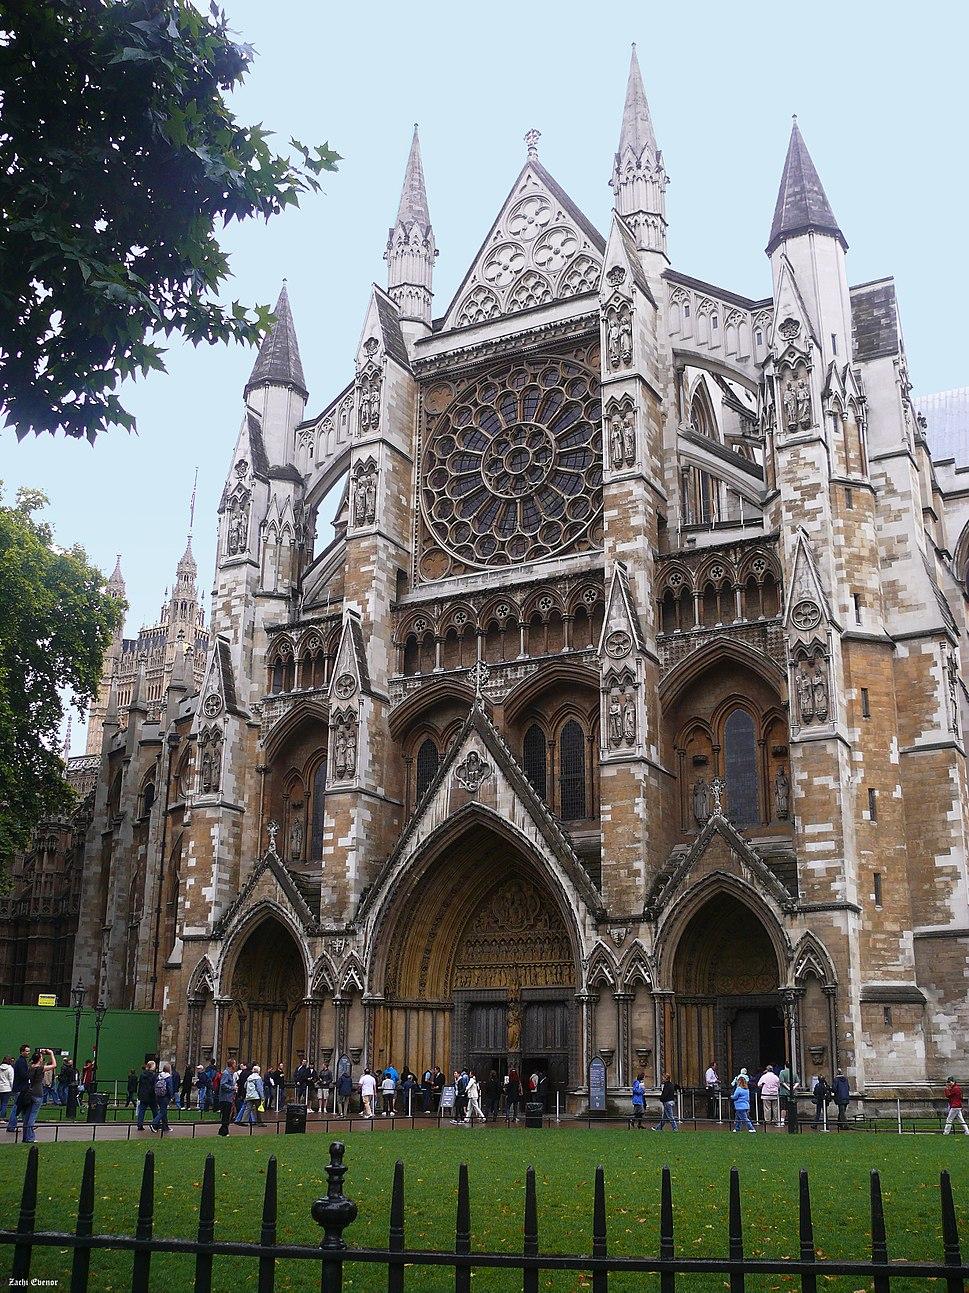 WestminsterAbbey-north-facade001m